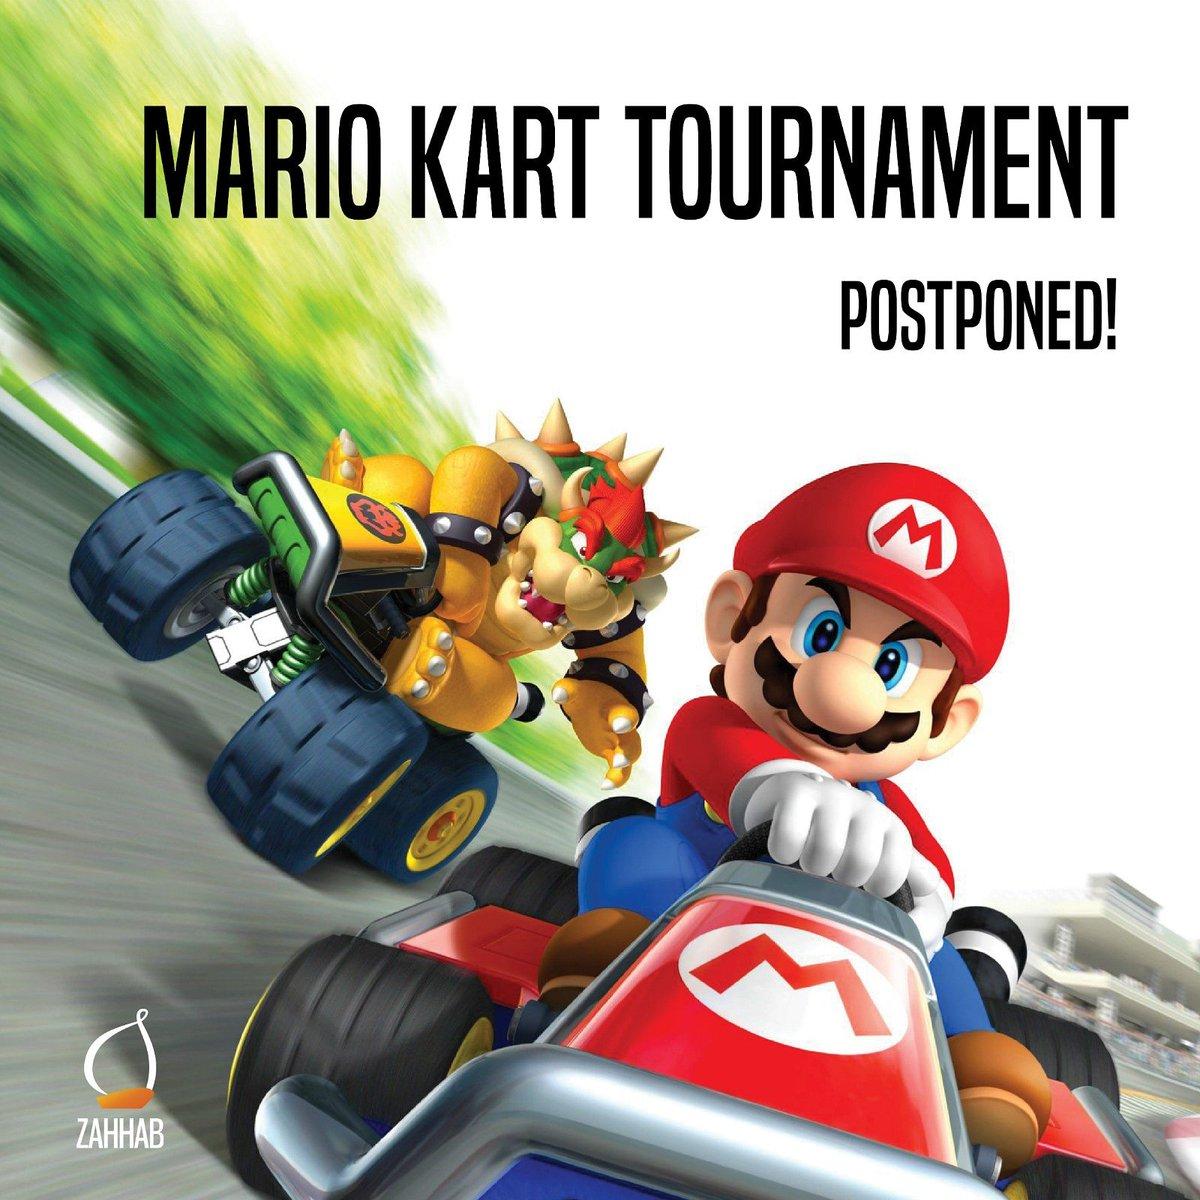 يؤسفنا تأجيل مسابقة ماريو كارت! سيتم اعلان تاريخ الجديد. Unfortunately, the mario kart tournament has been postponed. We will update you with new dates. https://t.co/6rtZFdJLTu